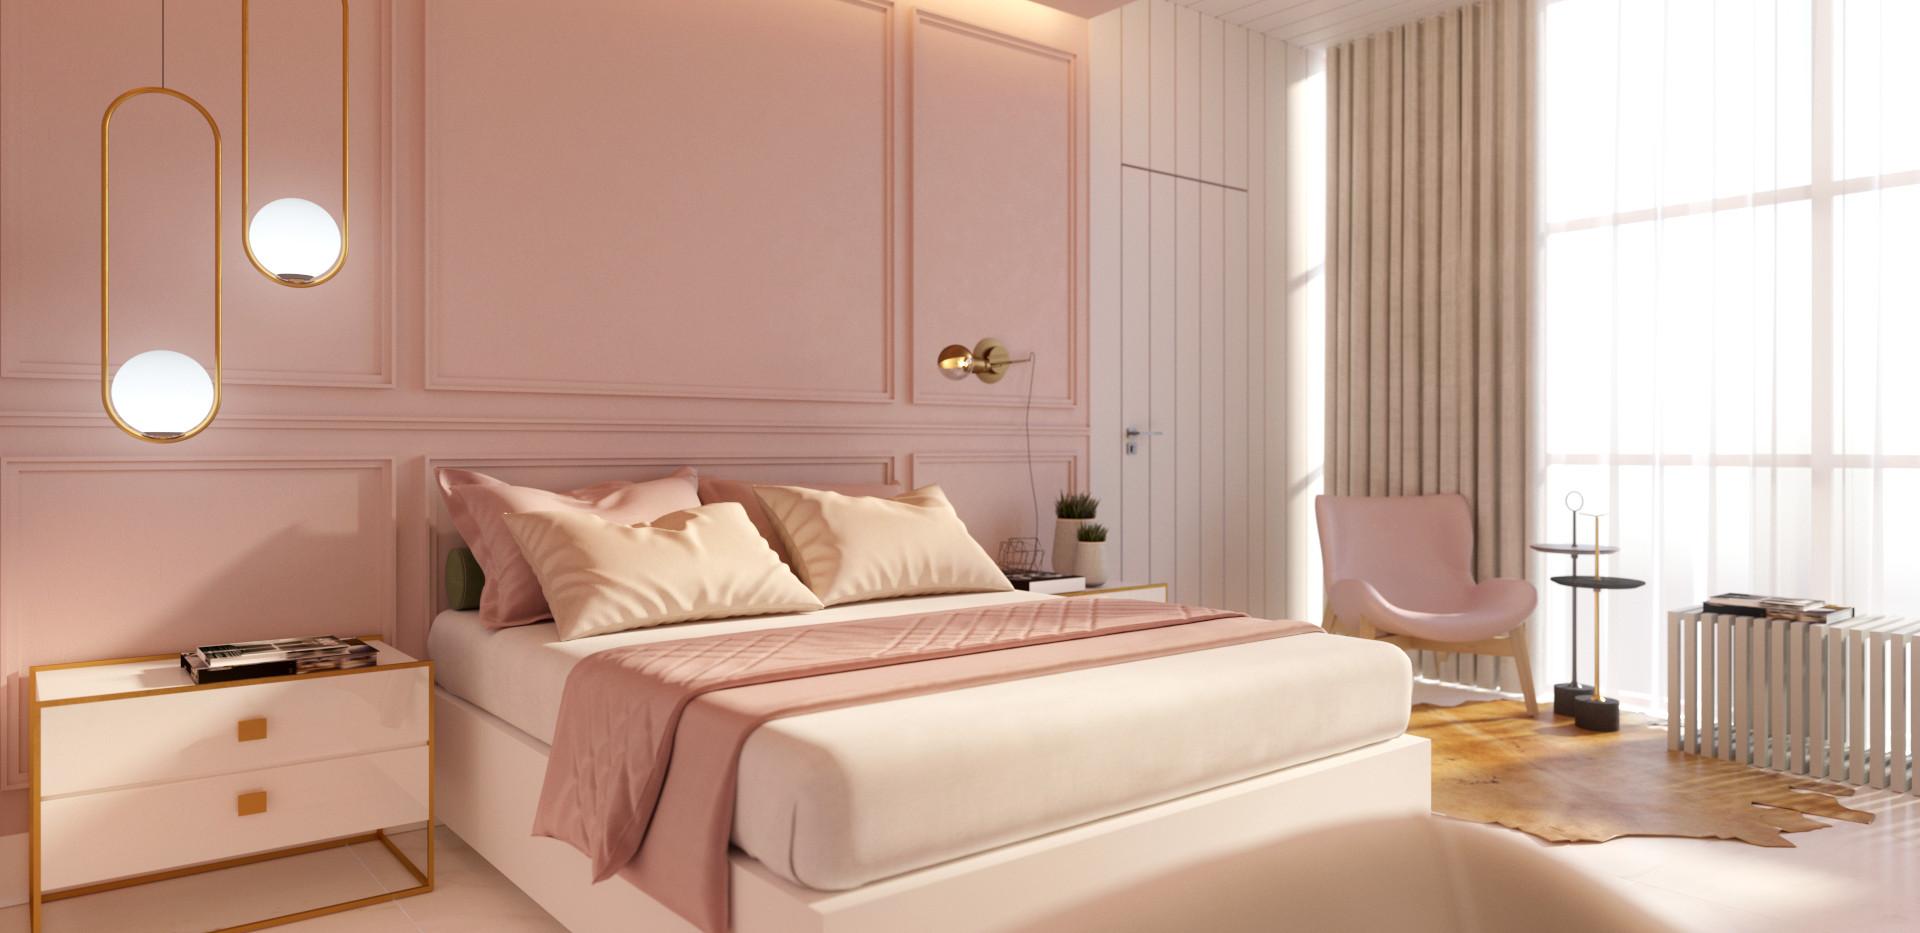 Pollyana - Pink room